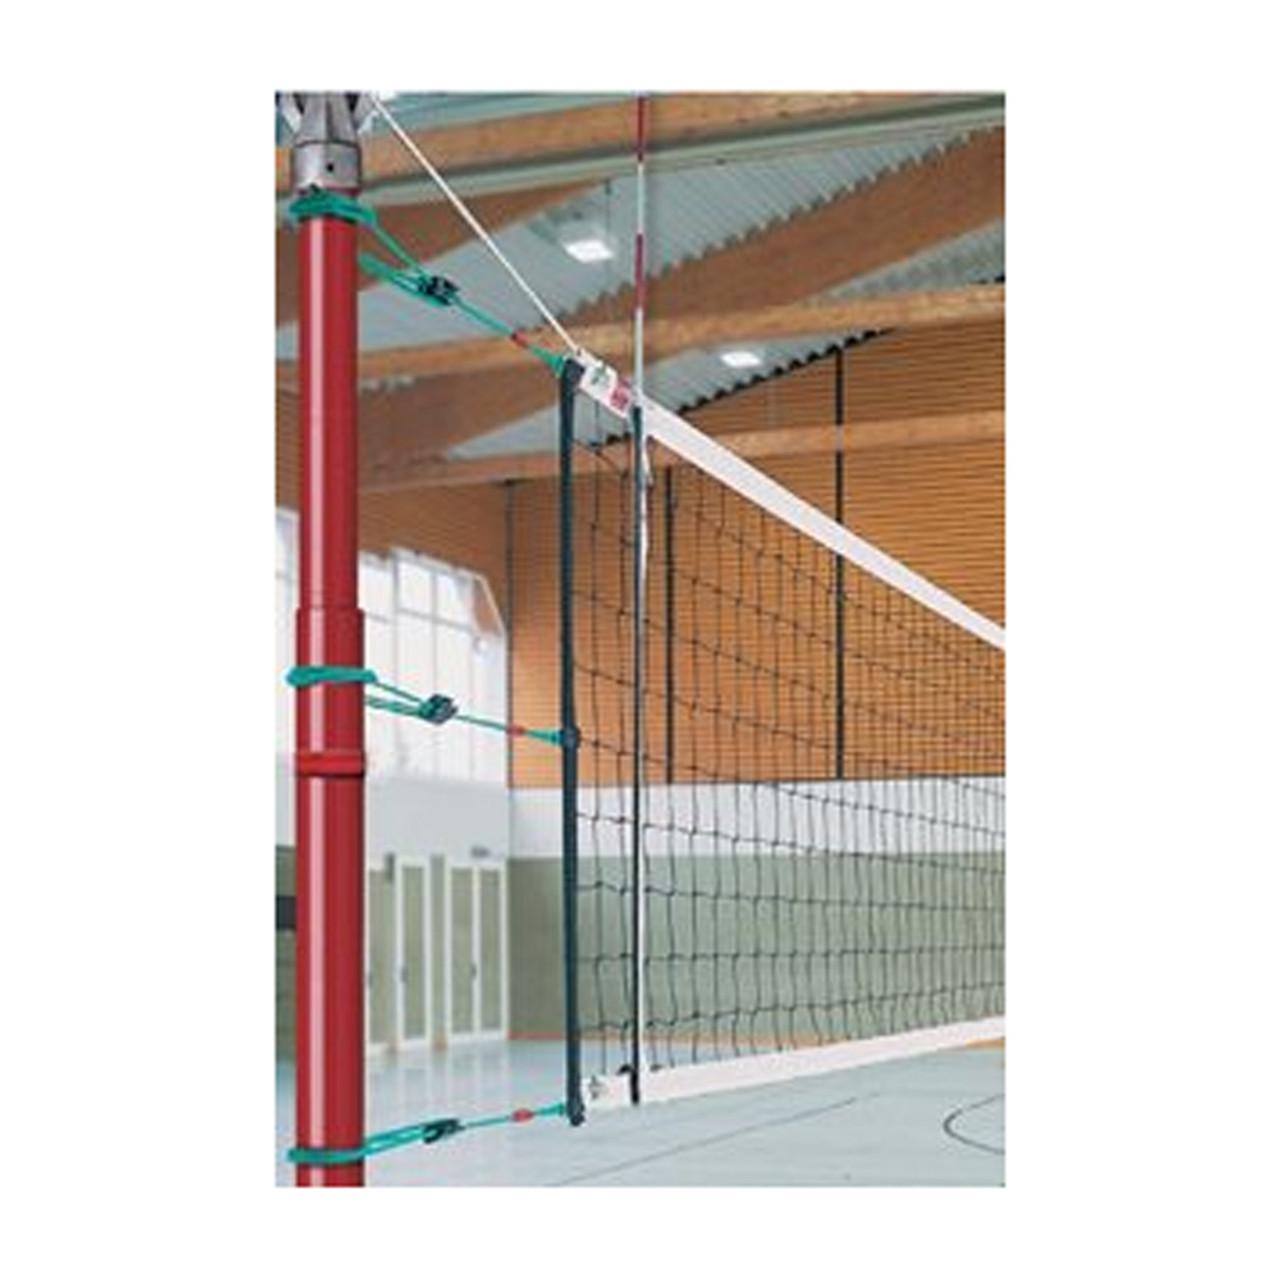 Buy International Regulation Volleyball Net Online Marchants Com